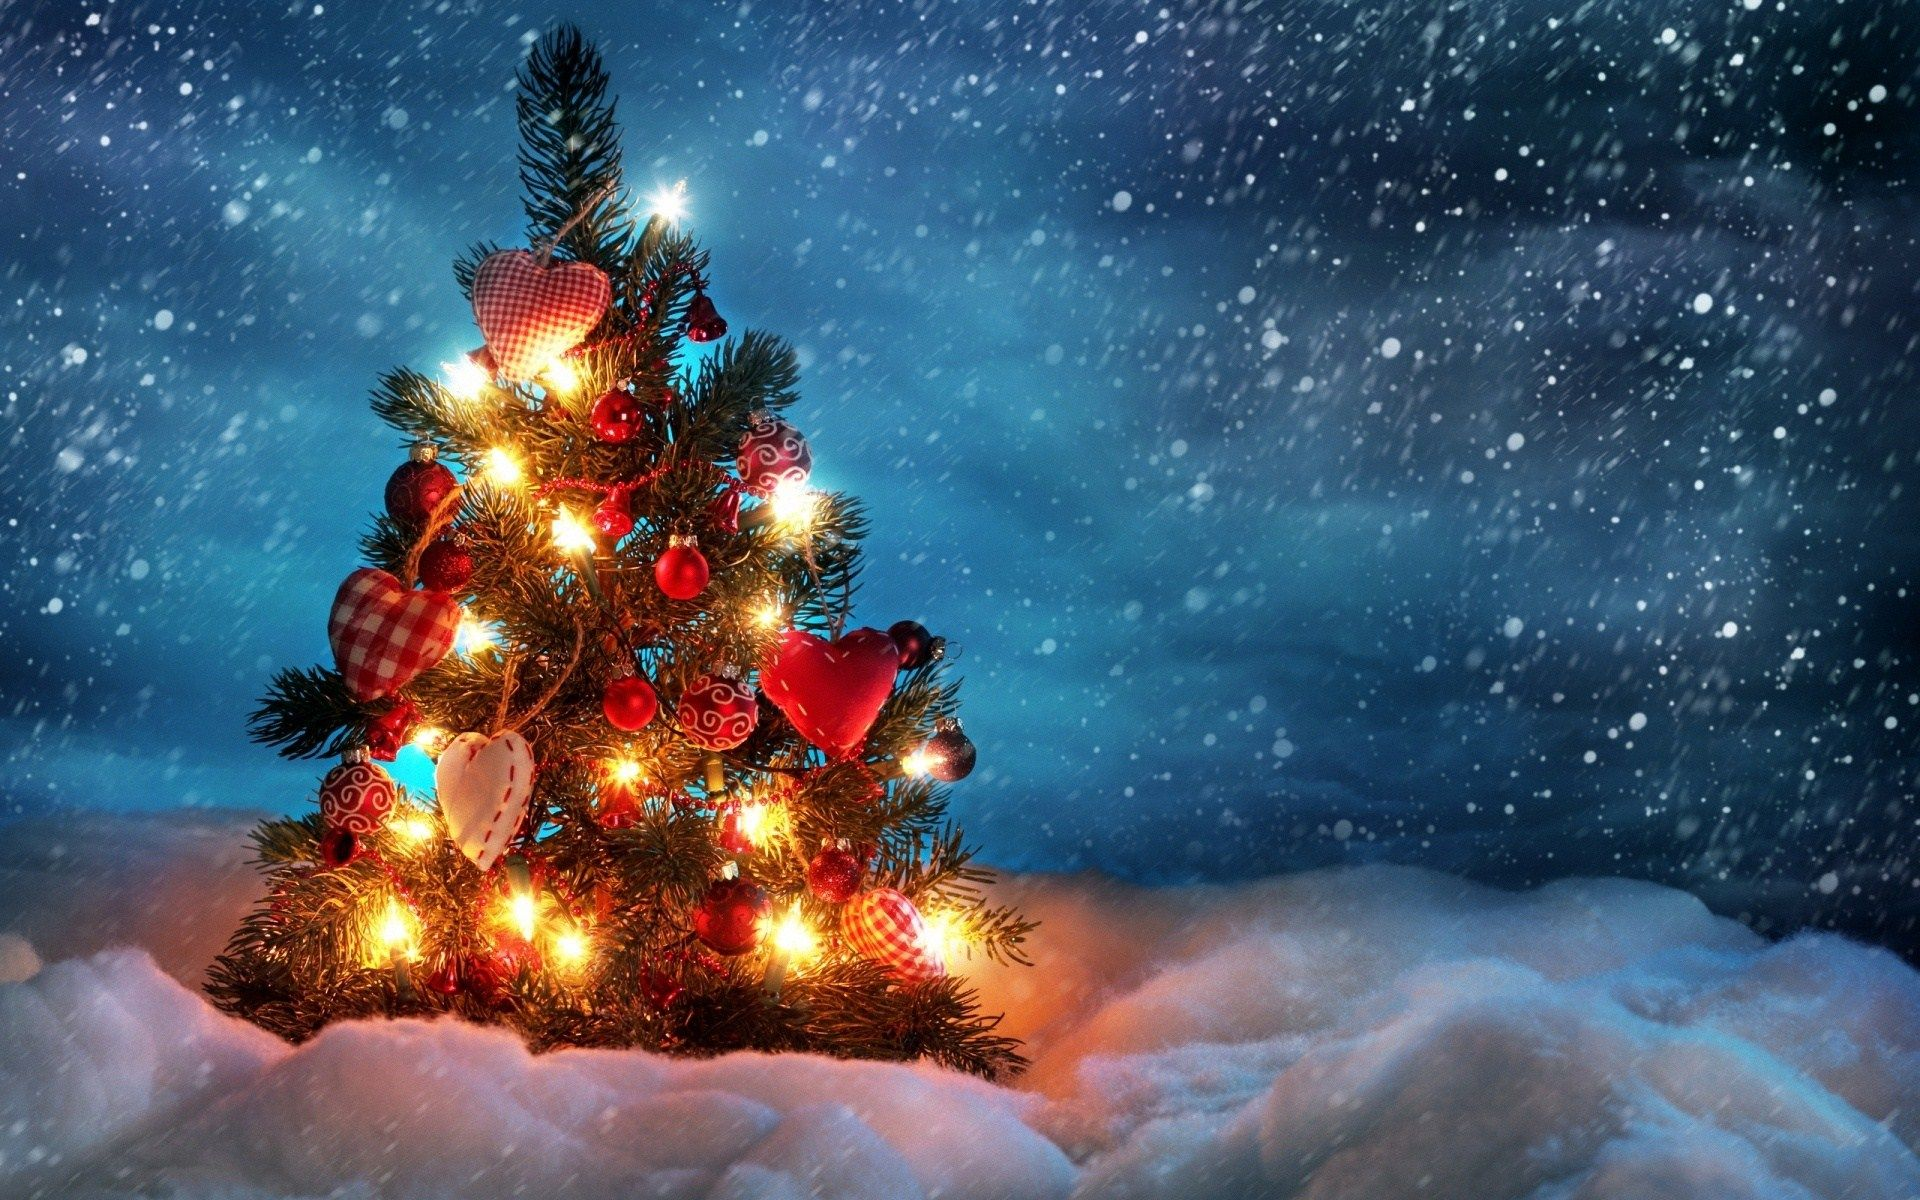 winter snow | snow-winter-christmas-tree-lights-snowflakes-wallpaper